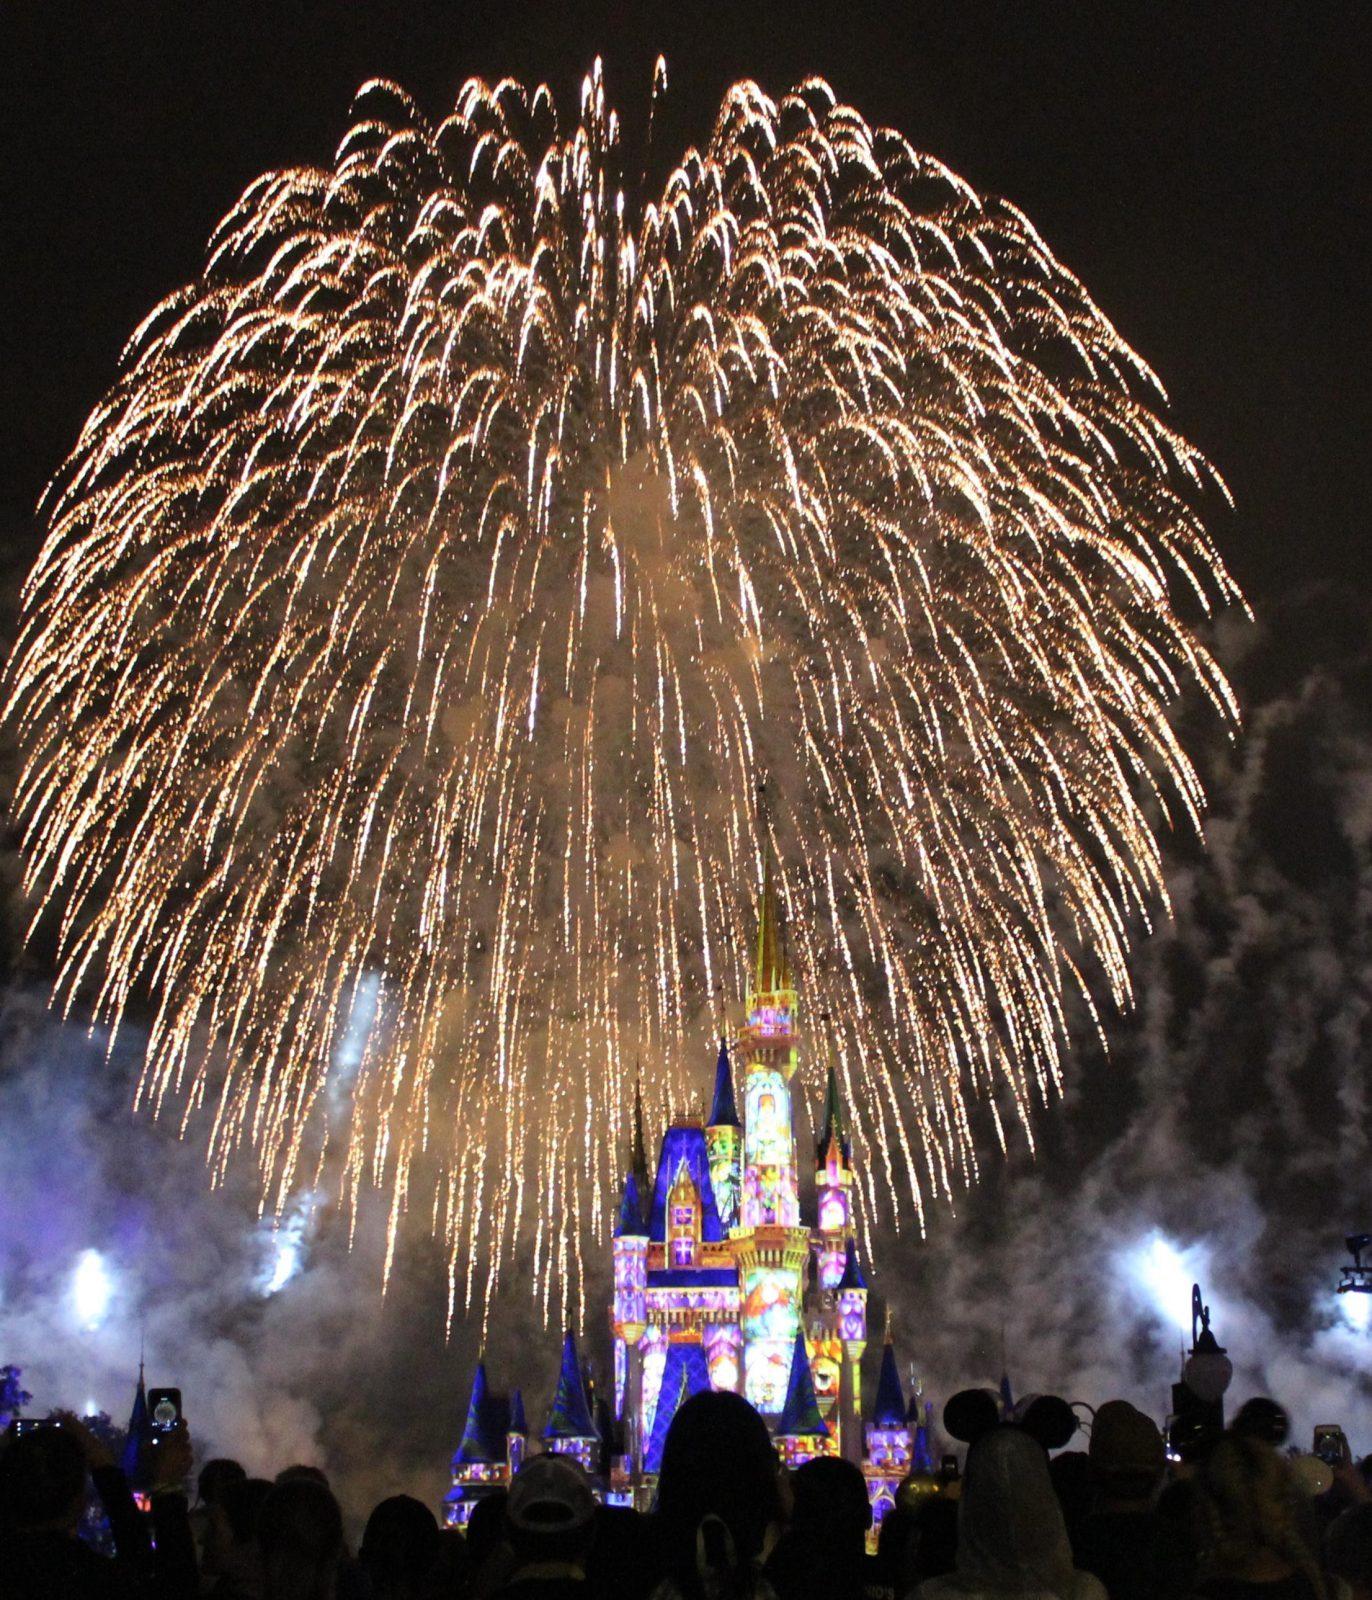 Fireworks at night over Cinderella's castle in Magic Kingdom